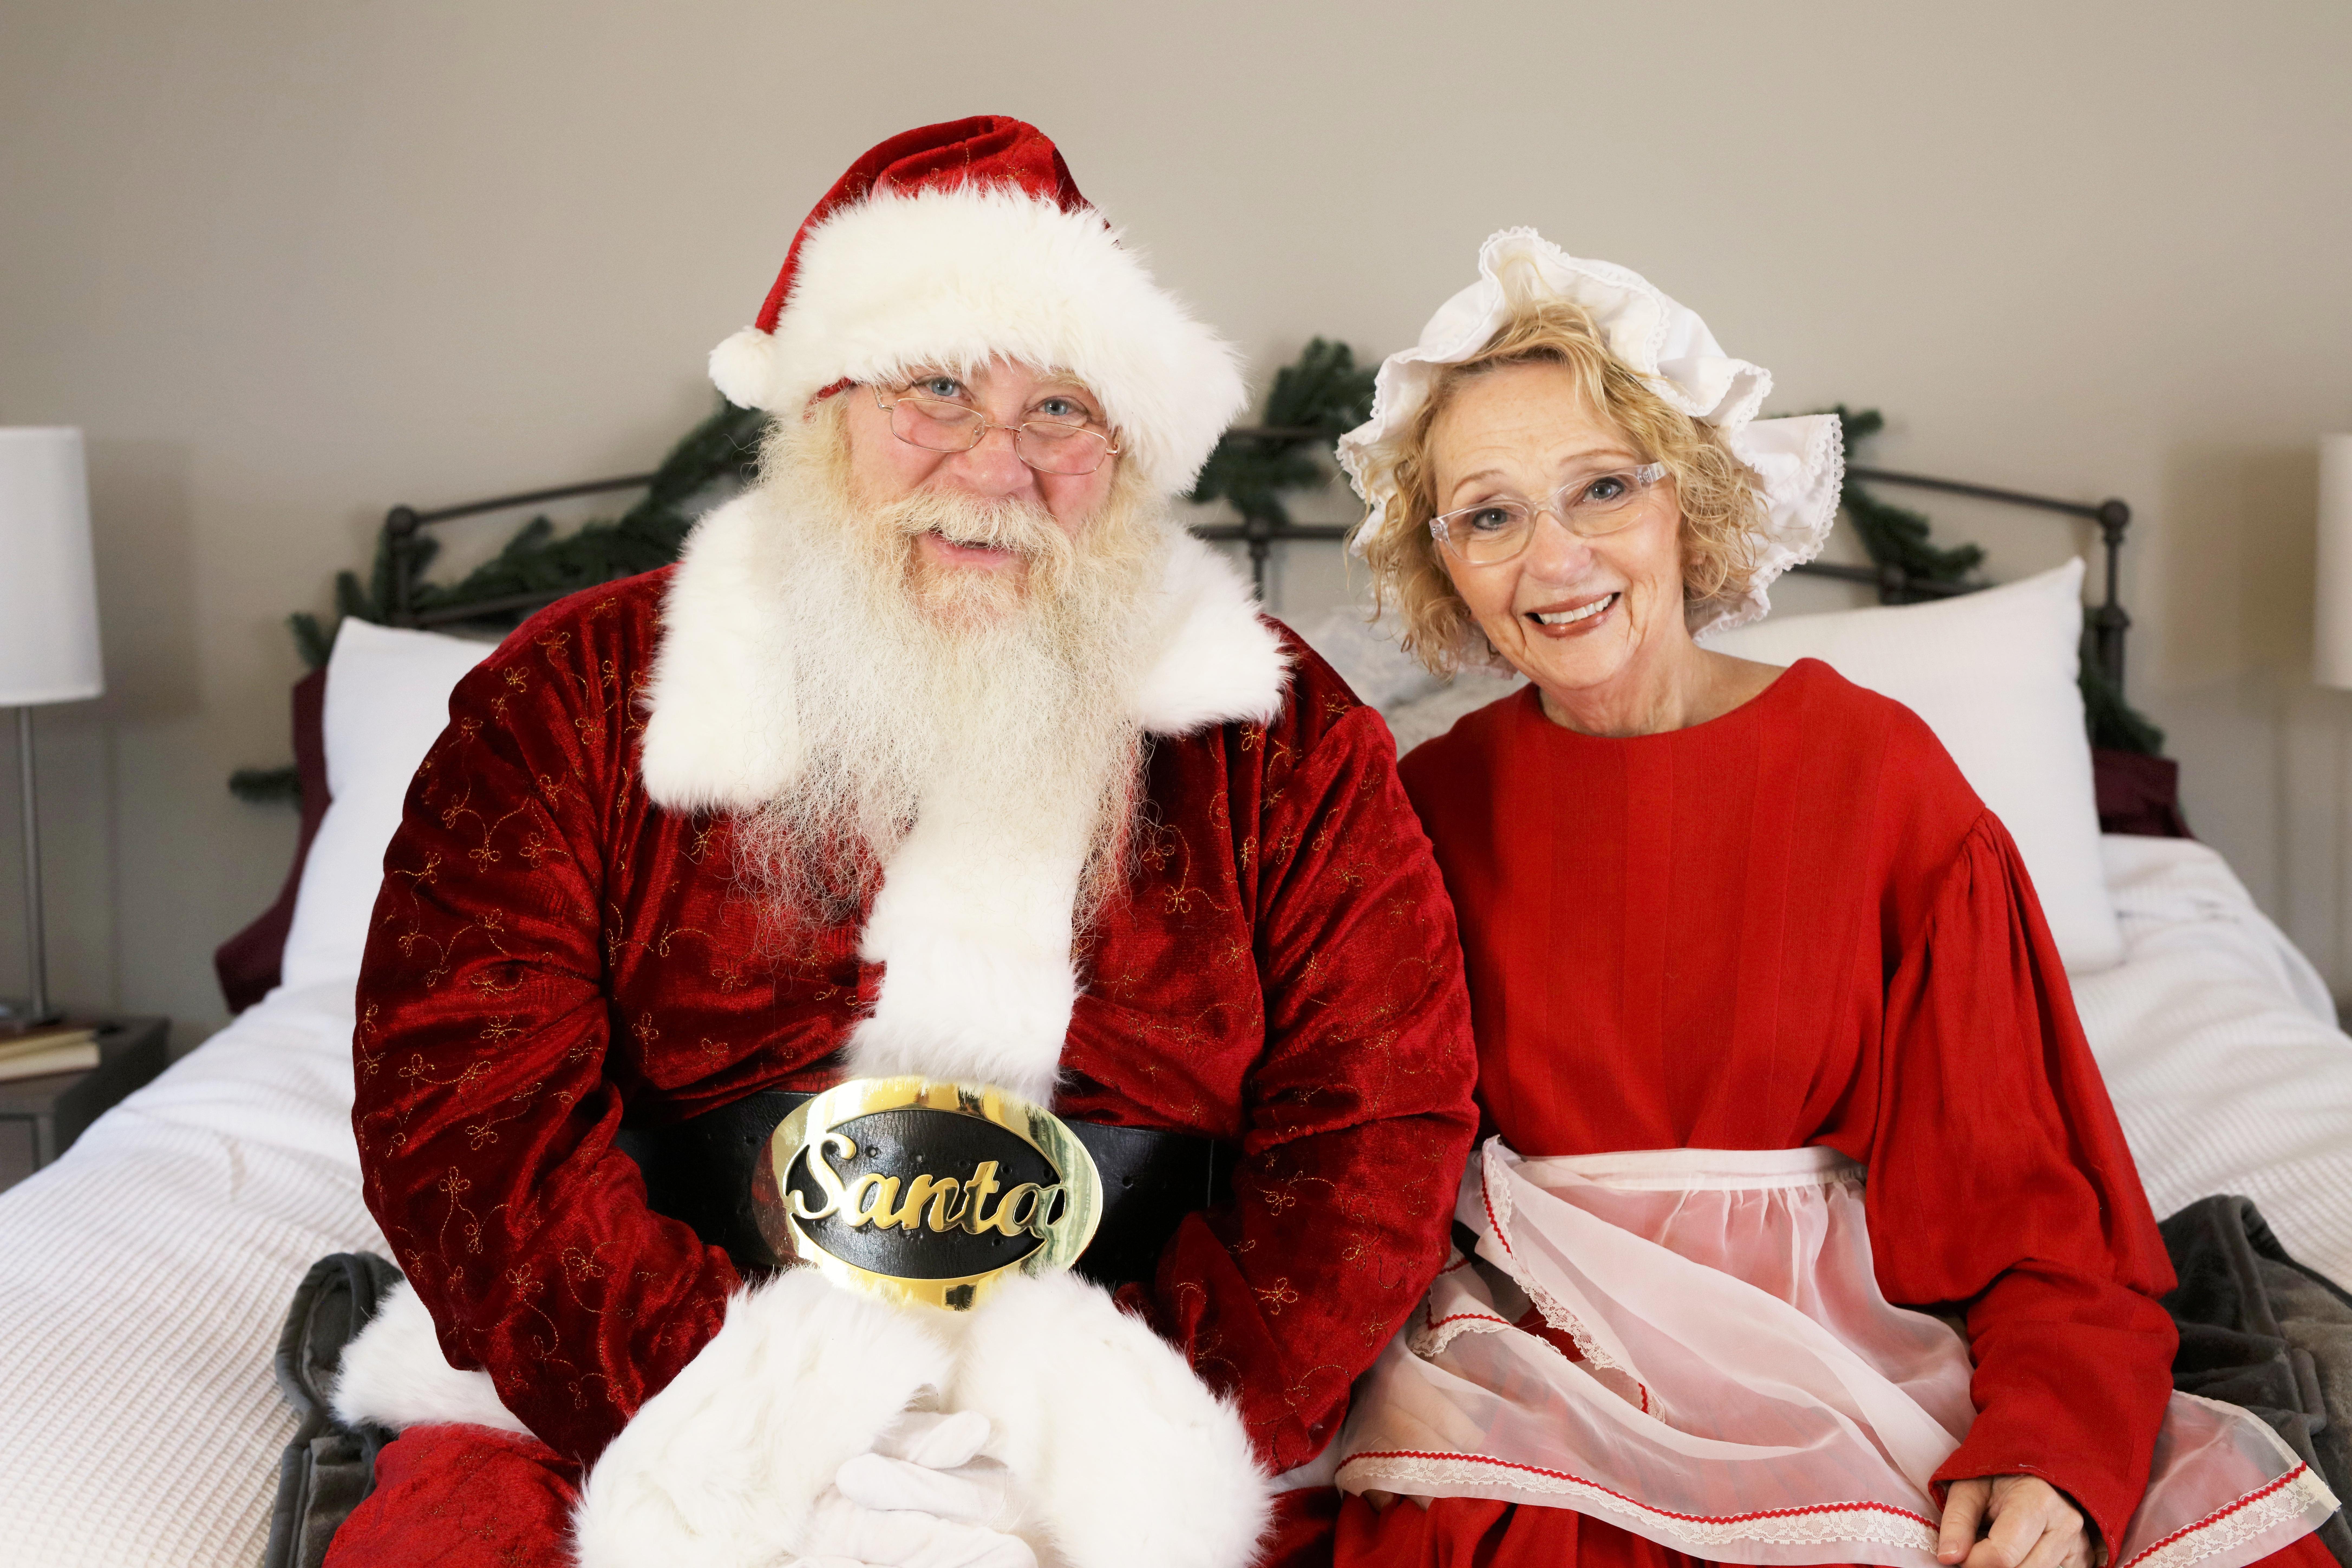 For additional images/broll: newsroom.sleepnumber.com/Santa